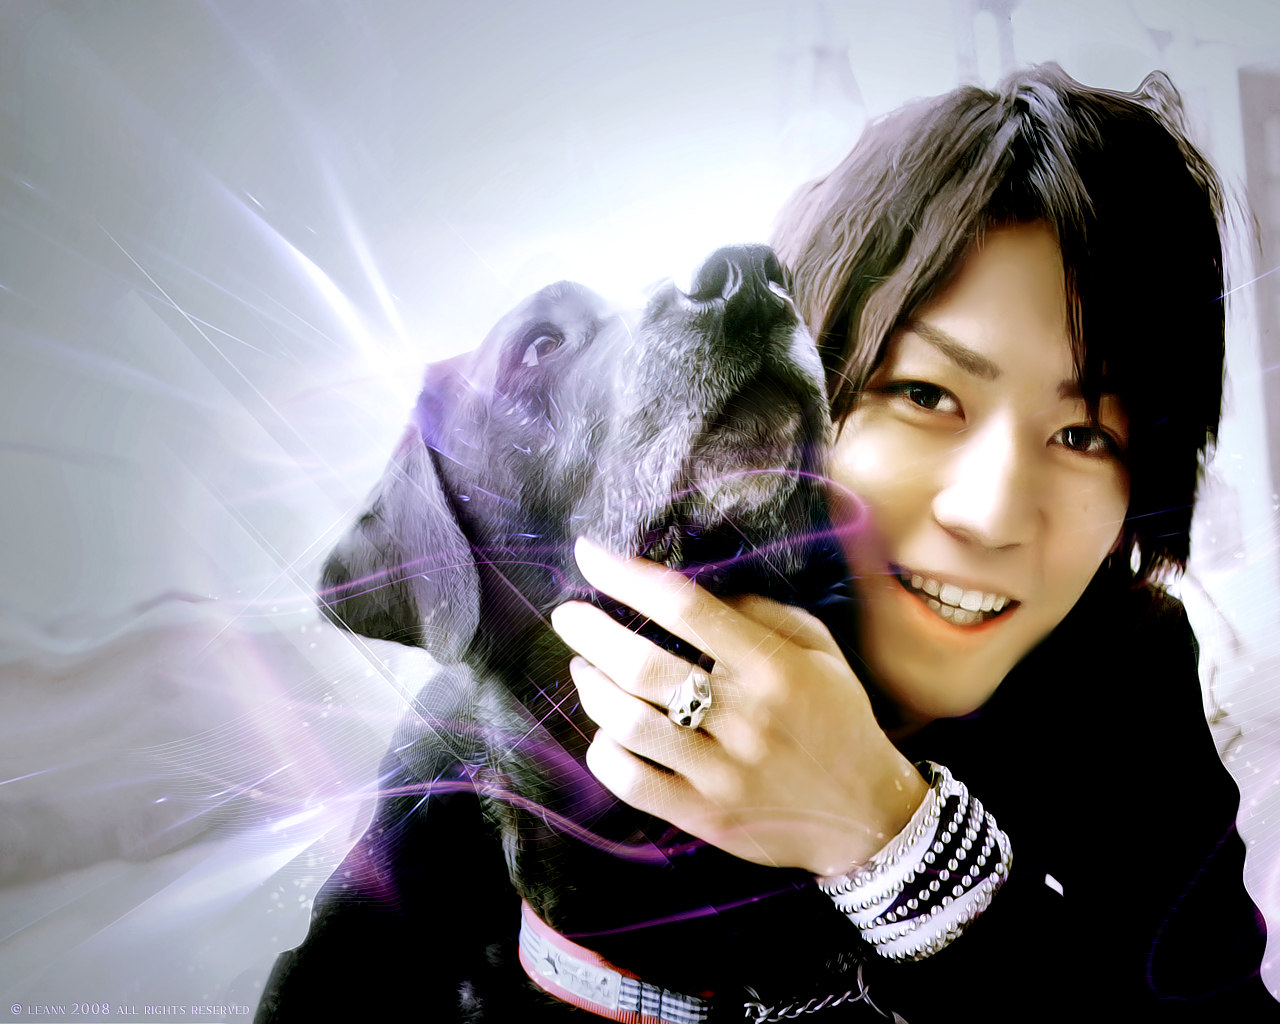 http://4.bp.blogspot.com/_S0seWV0VmsA/TVEmeSw1NMI/AAAAAAAAC1M/22VybR5XSPk/s1600/with+puppy_kamenashi_1280%25C3%25971024.jpg